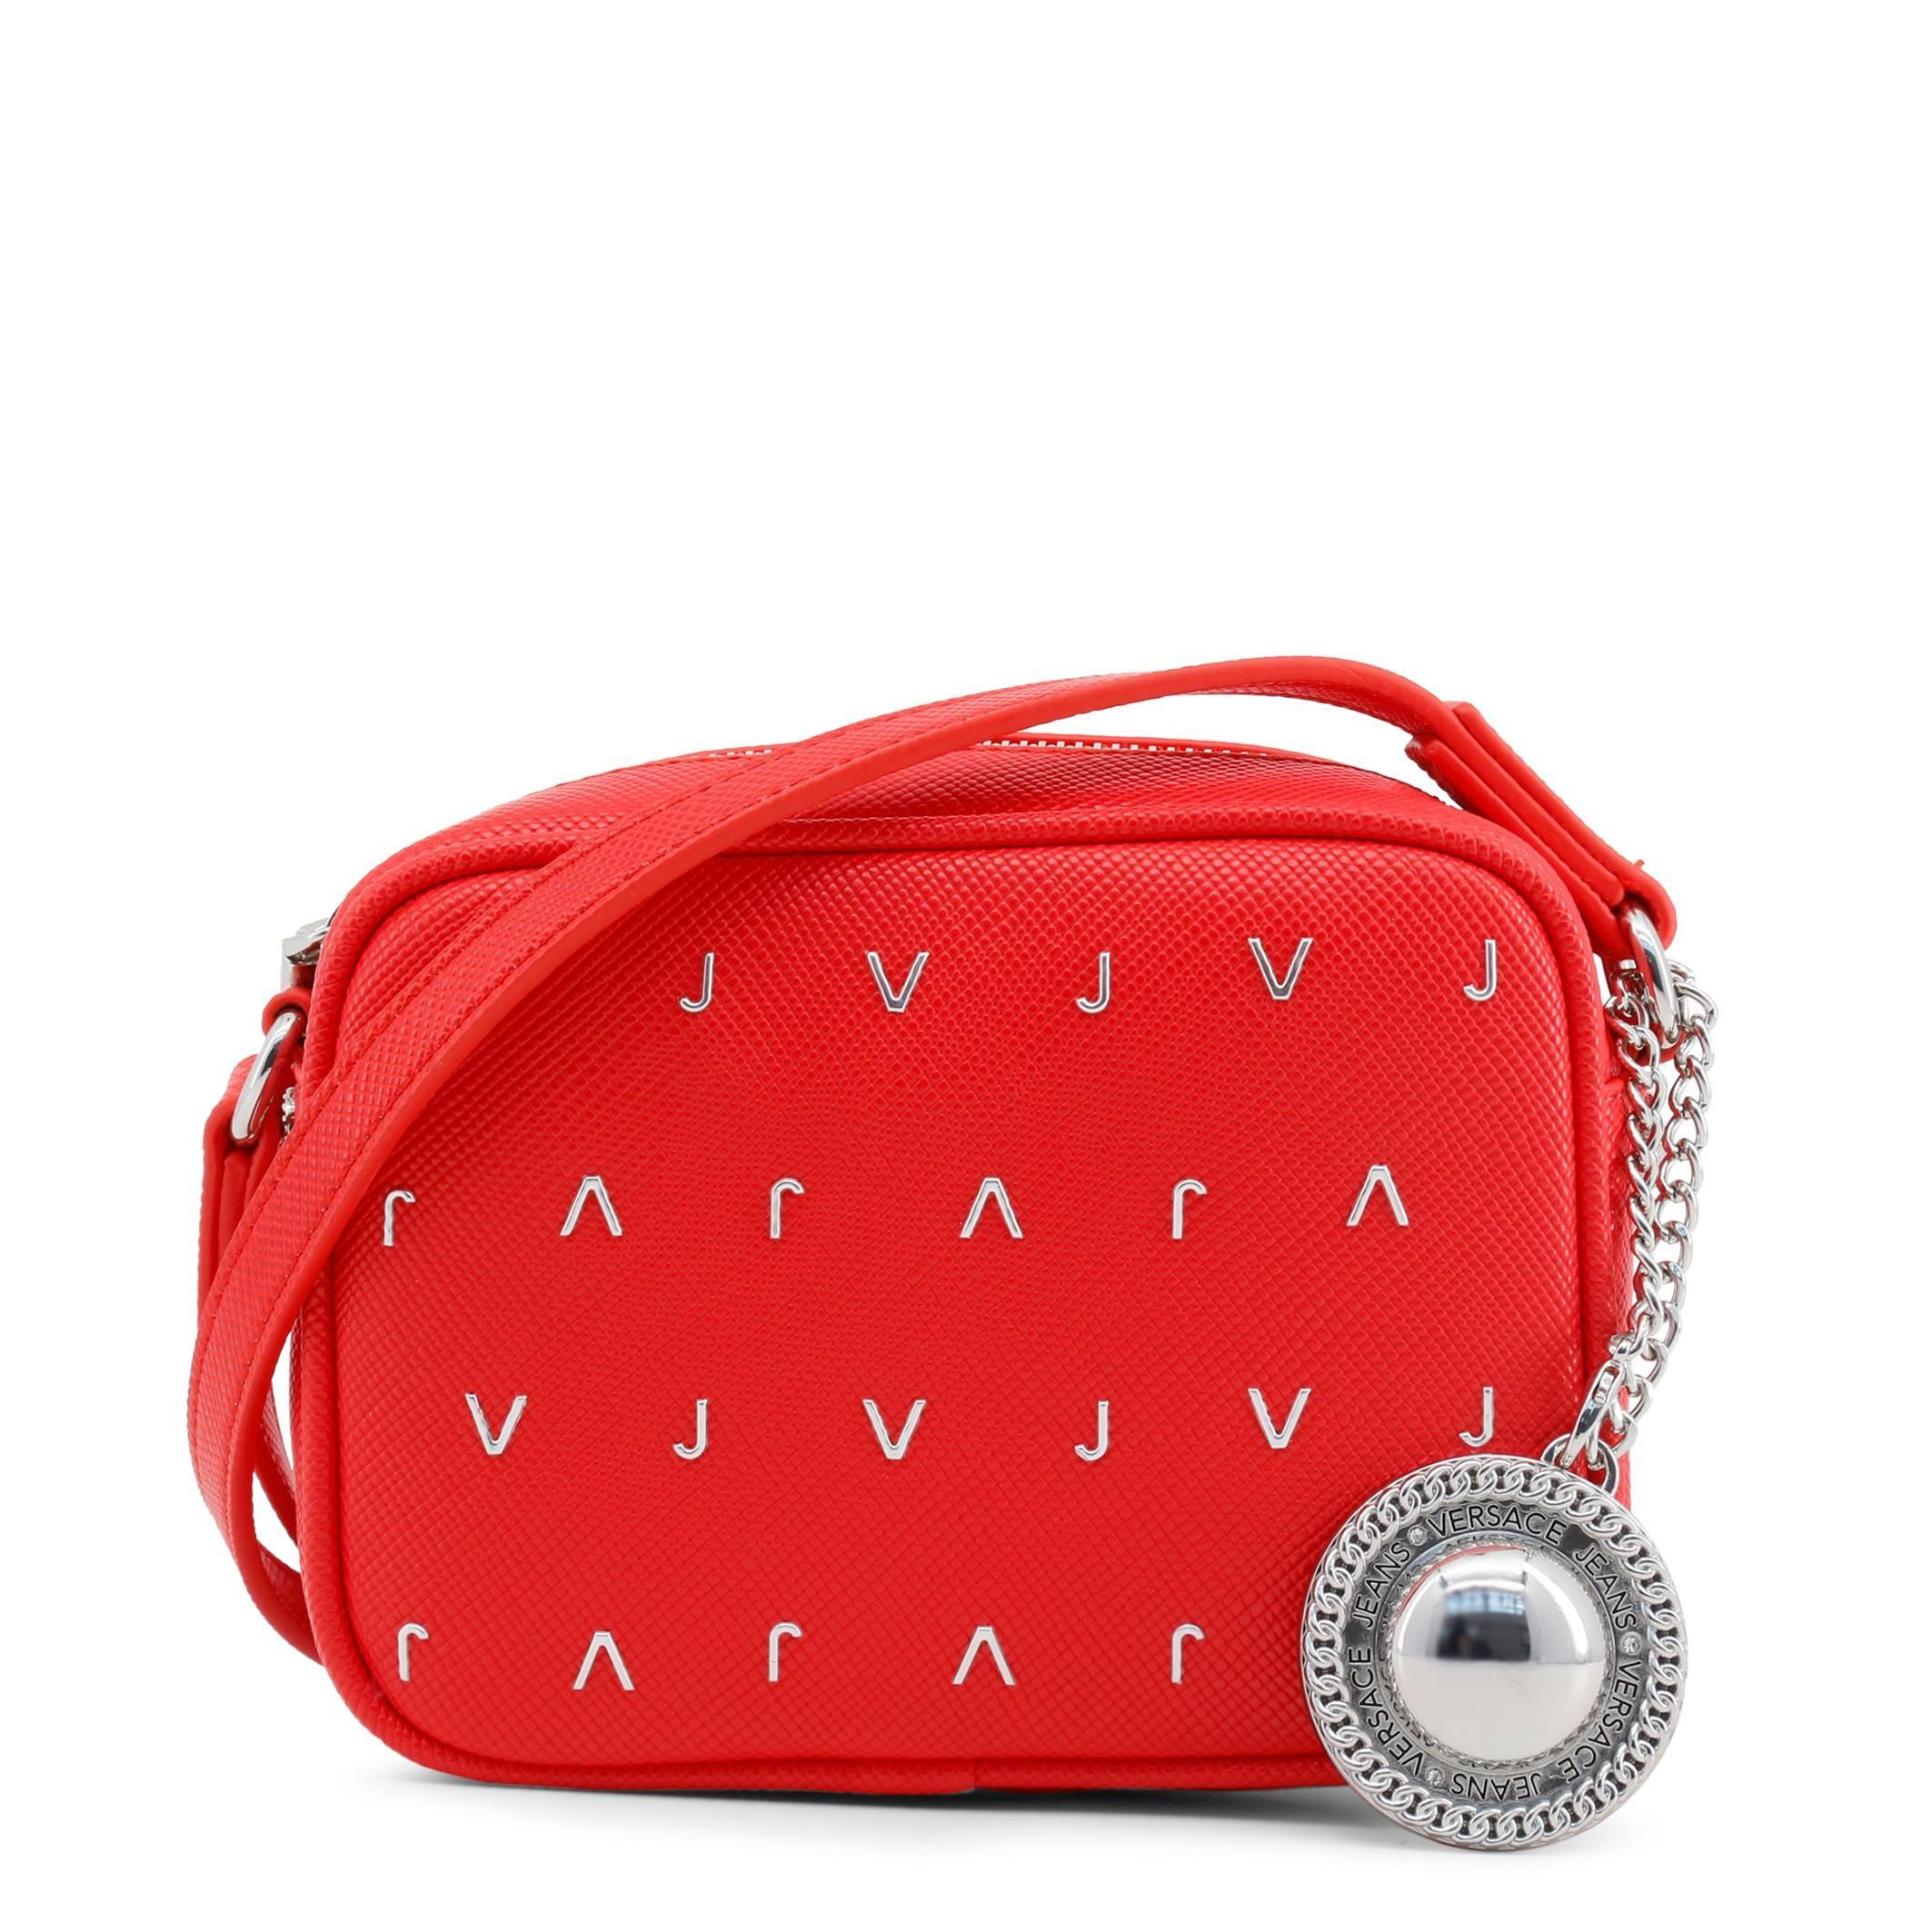 f4f4cb7803c0 Versace Jeans Red Crossbody Bag